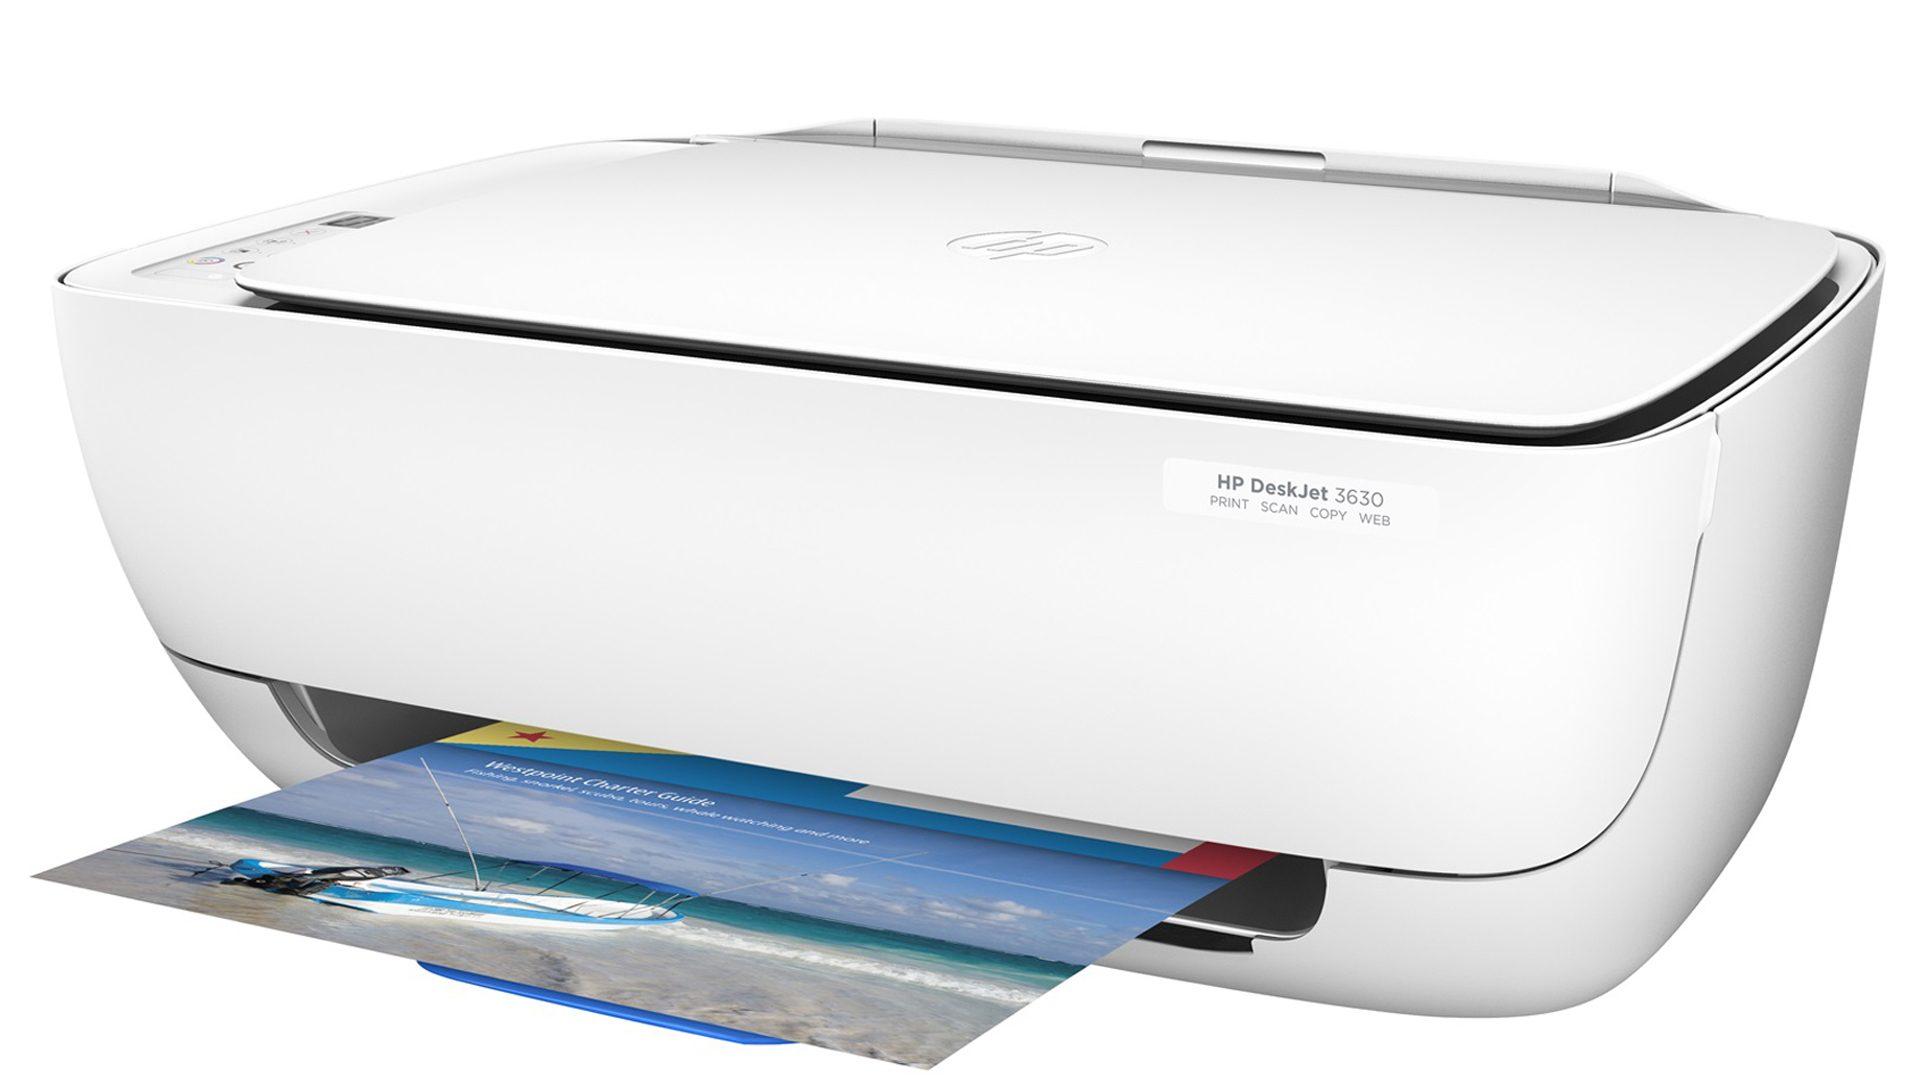 HP-Deskjet-3630-Ansichten_4